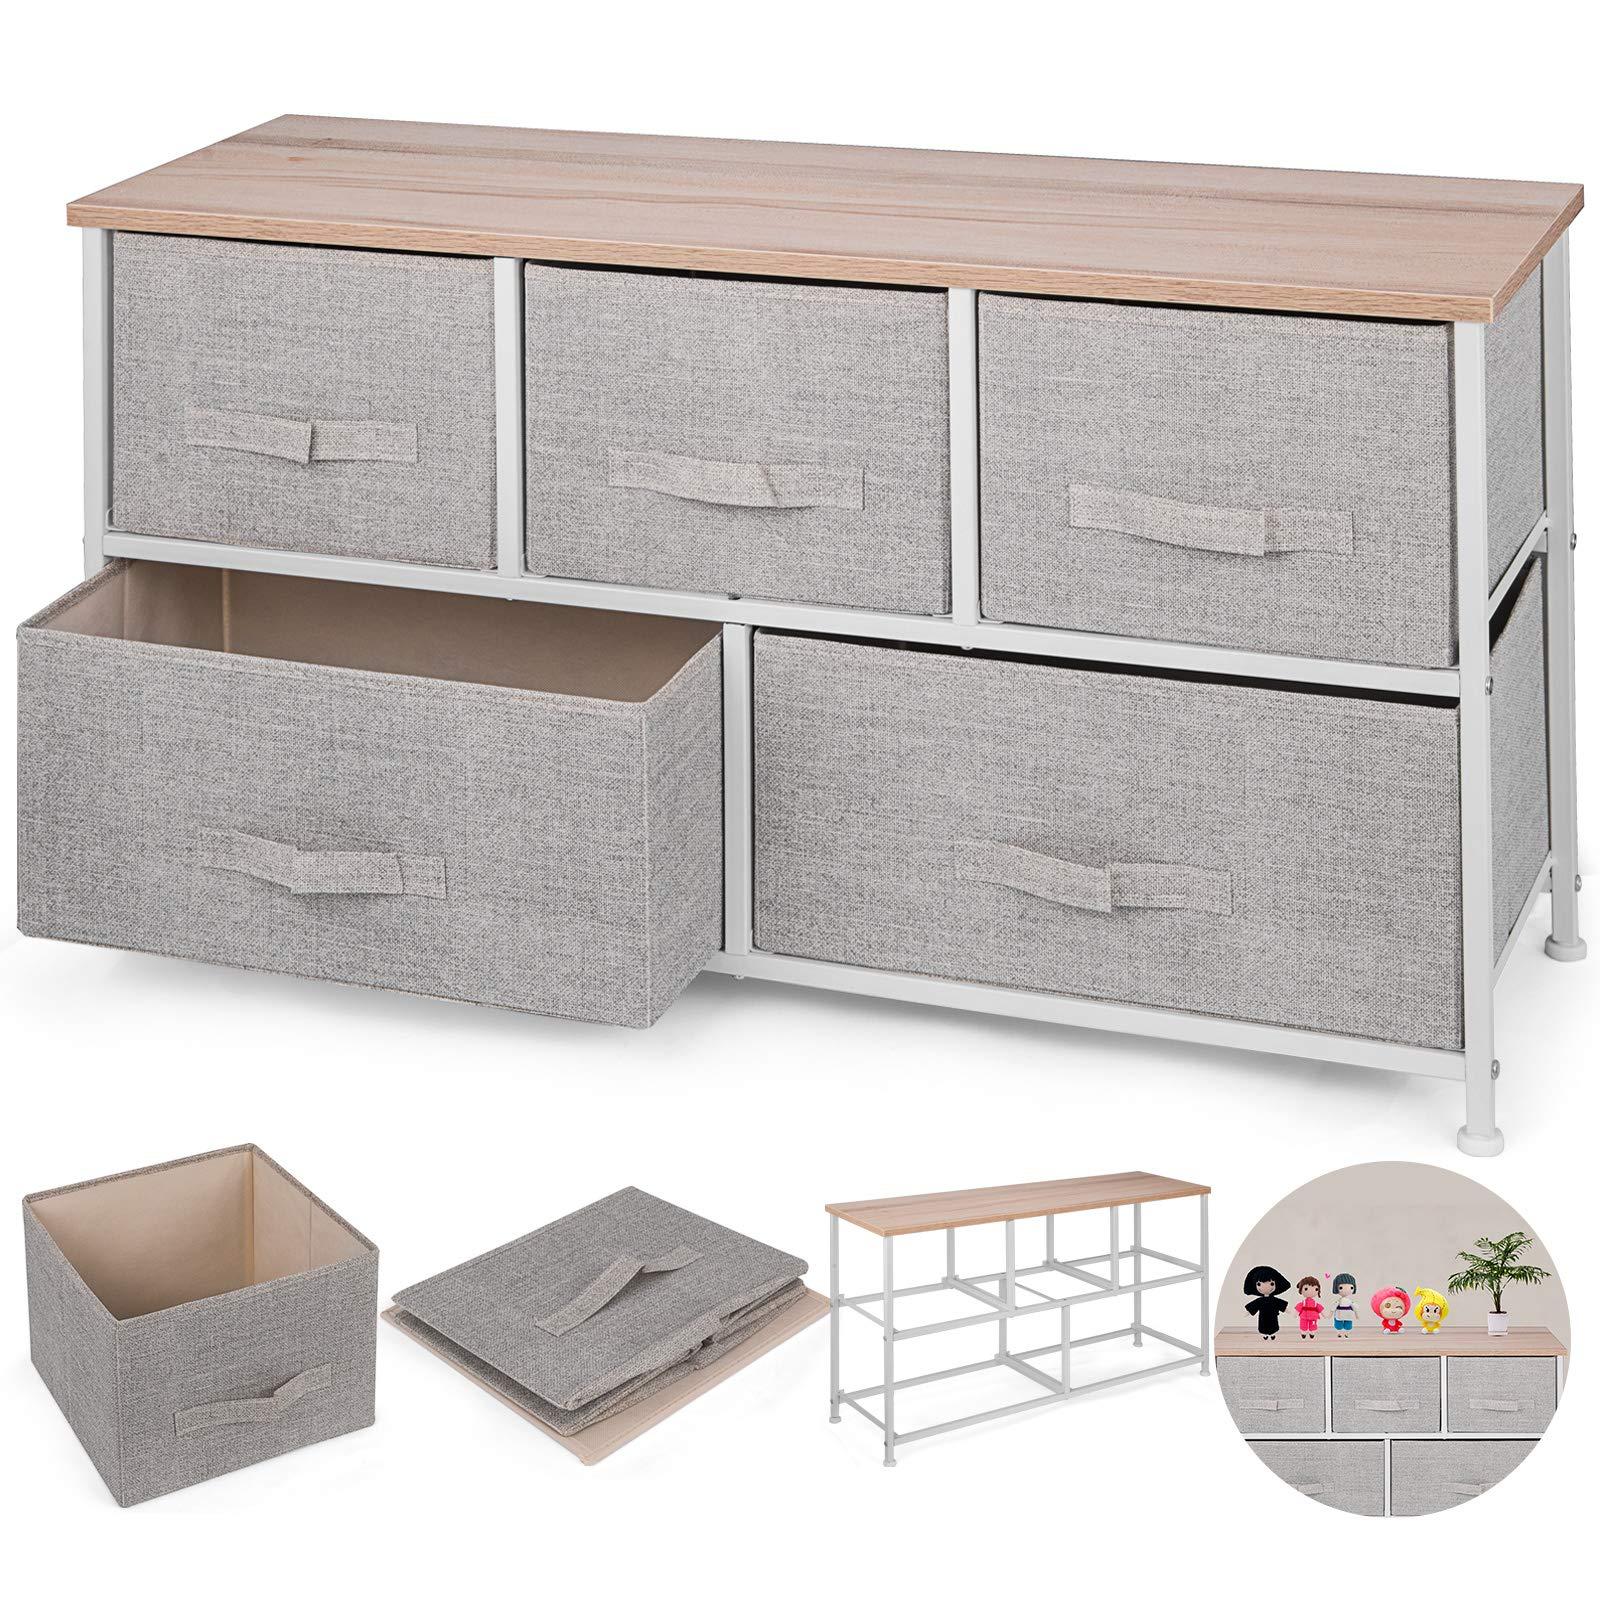 Happybuy 5-Drawer Storage Organizer Unit with Fabric Bins Bedroom Play Room Entryway Hallway Closets Steel Frame MDF Top Dresser Storage Tower Fabric Cube Dresser Chest Cabinet (Beige/Wide)